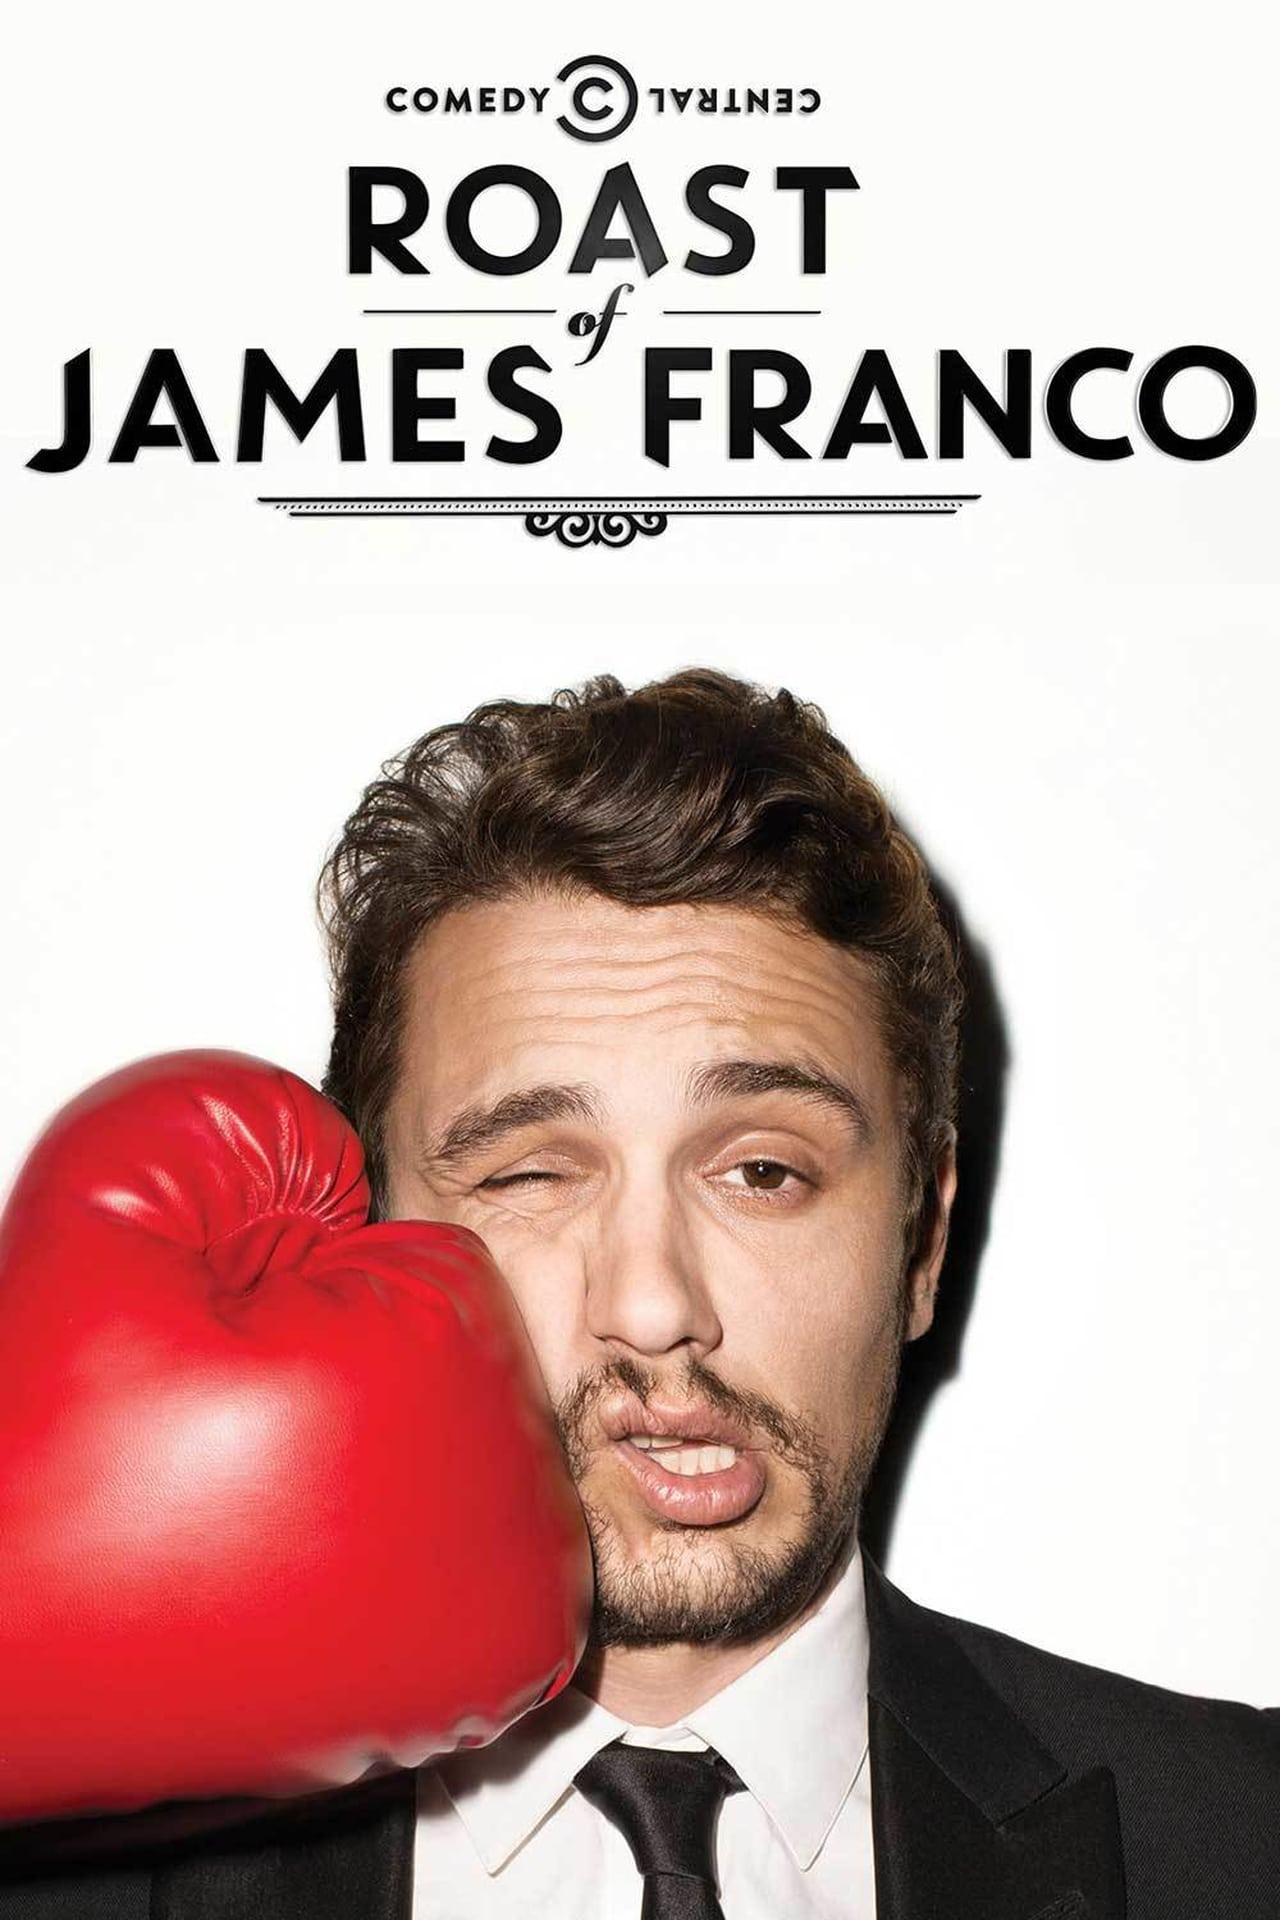 Comedy Central Roast of James Franco (2013) - IMDb